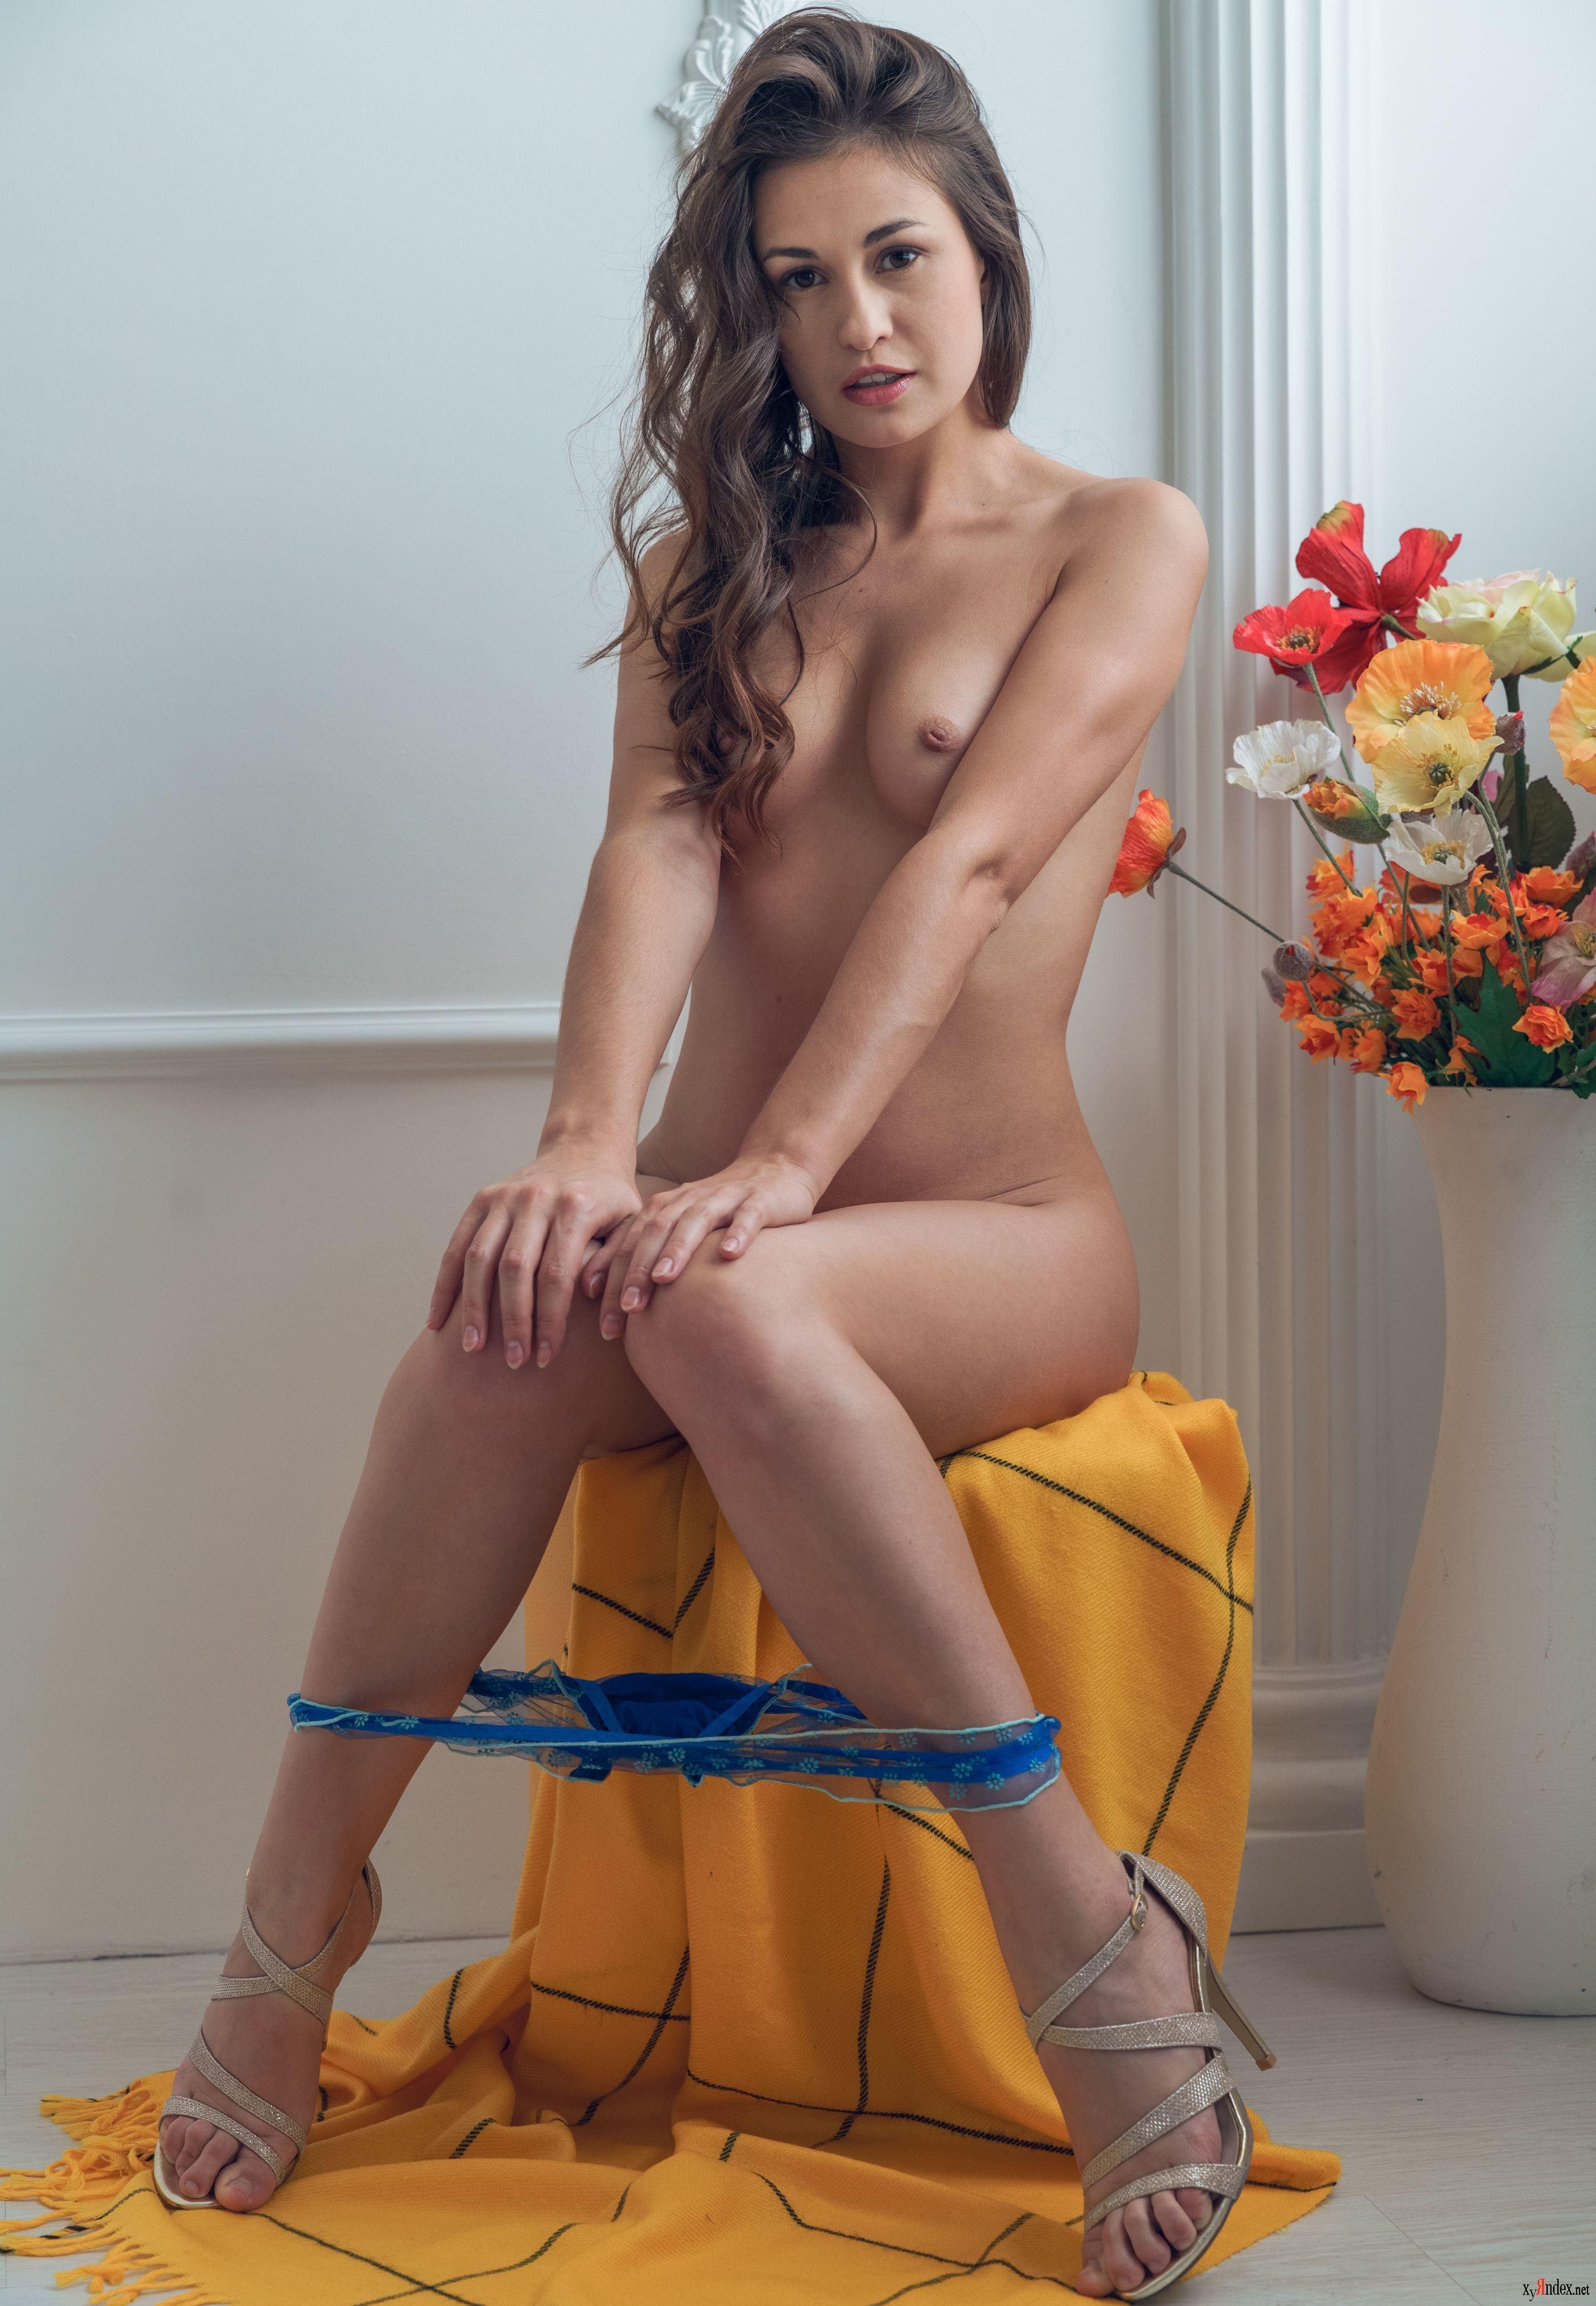 Liliana ftv girl nude